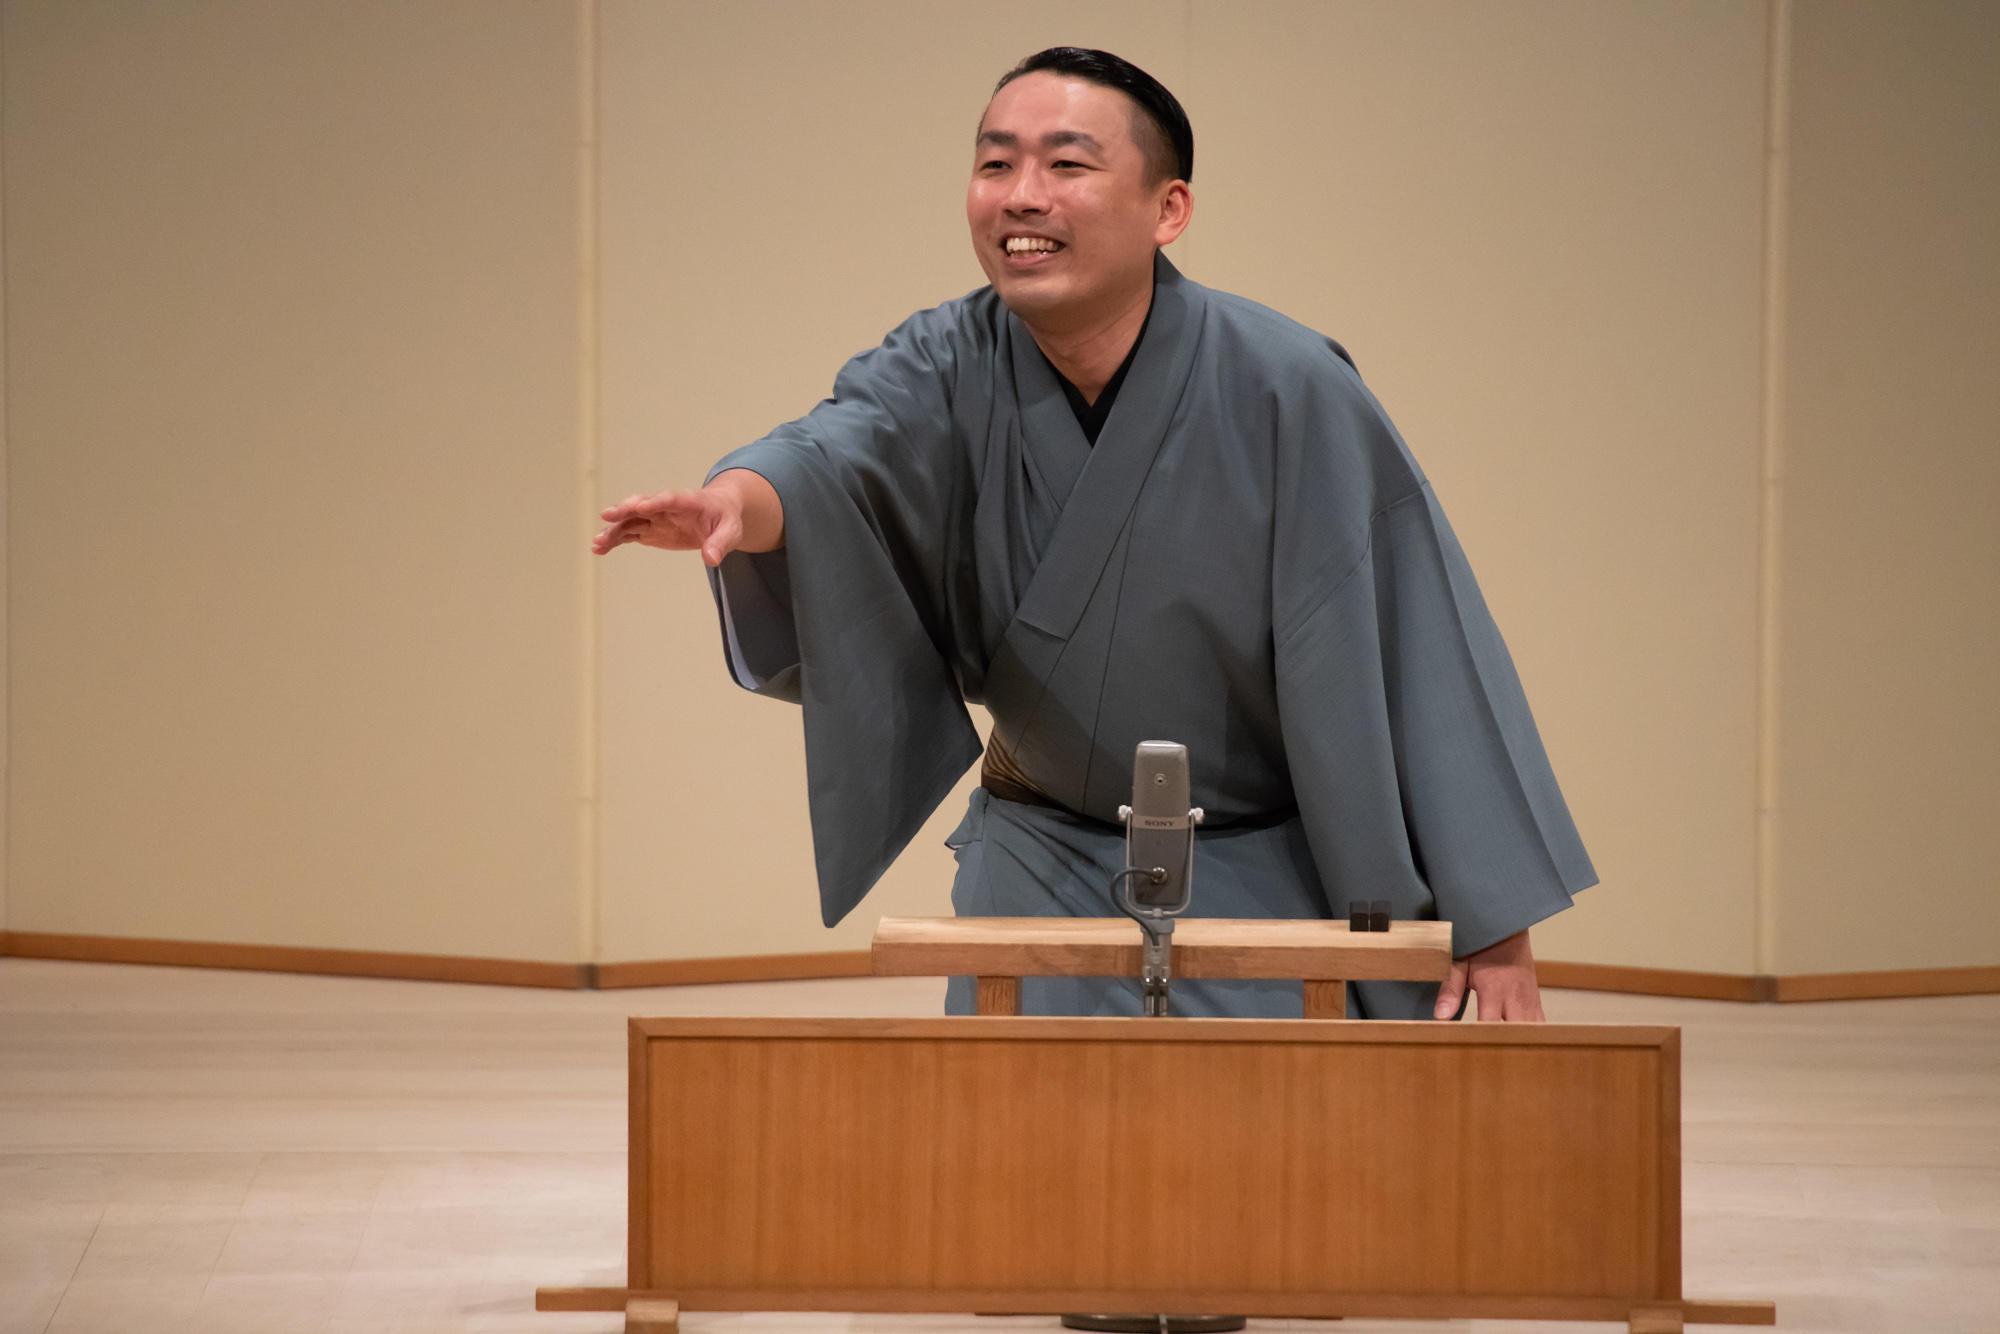 http://news.yoshimoto.co.jp/20180809182515-3cdfe1a8475f65497c7a0adea92eec47a8ac7bb2.jpg